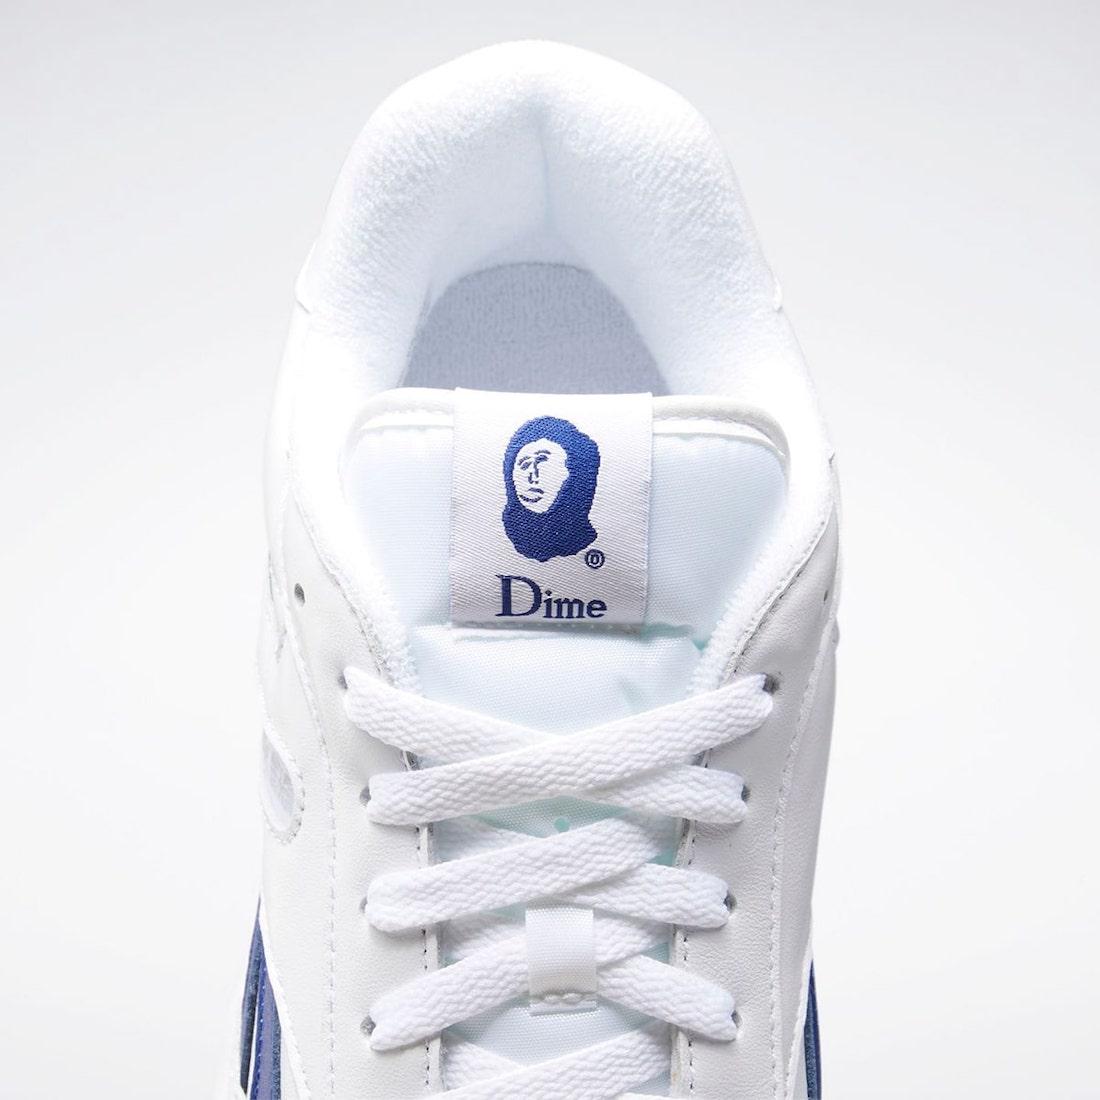 Dime Reebok BB4000 White Blue Q47373 Release Date Info